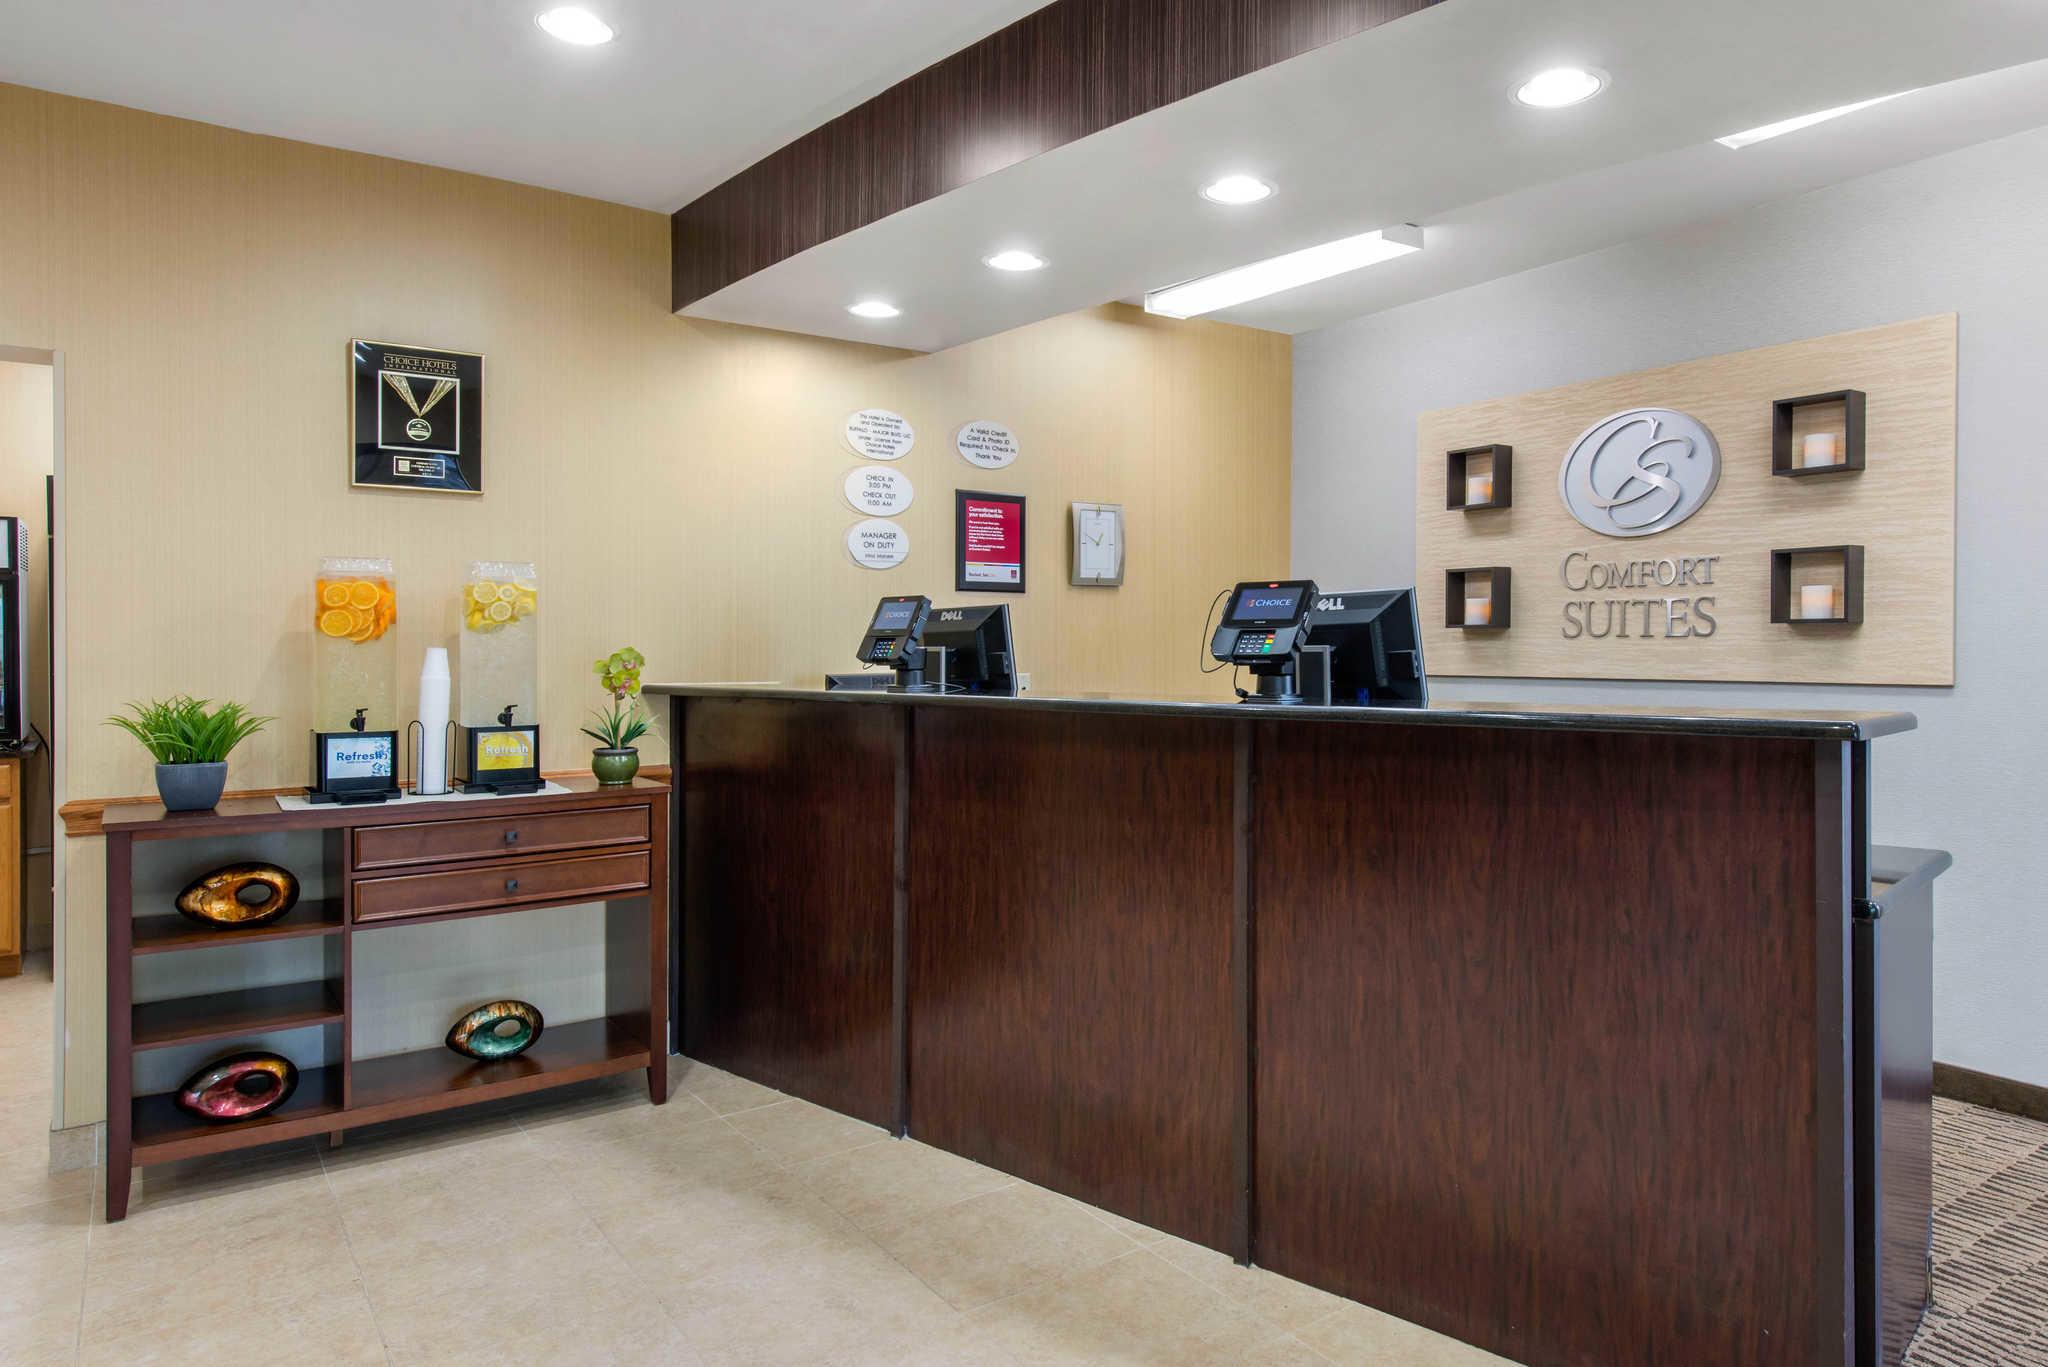 Comfort Suites Near Universal Orlando Resort image 2